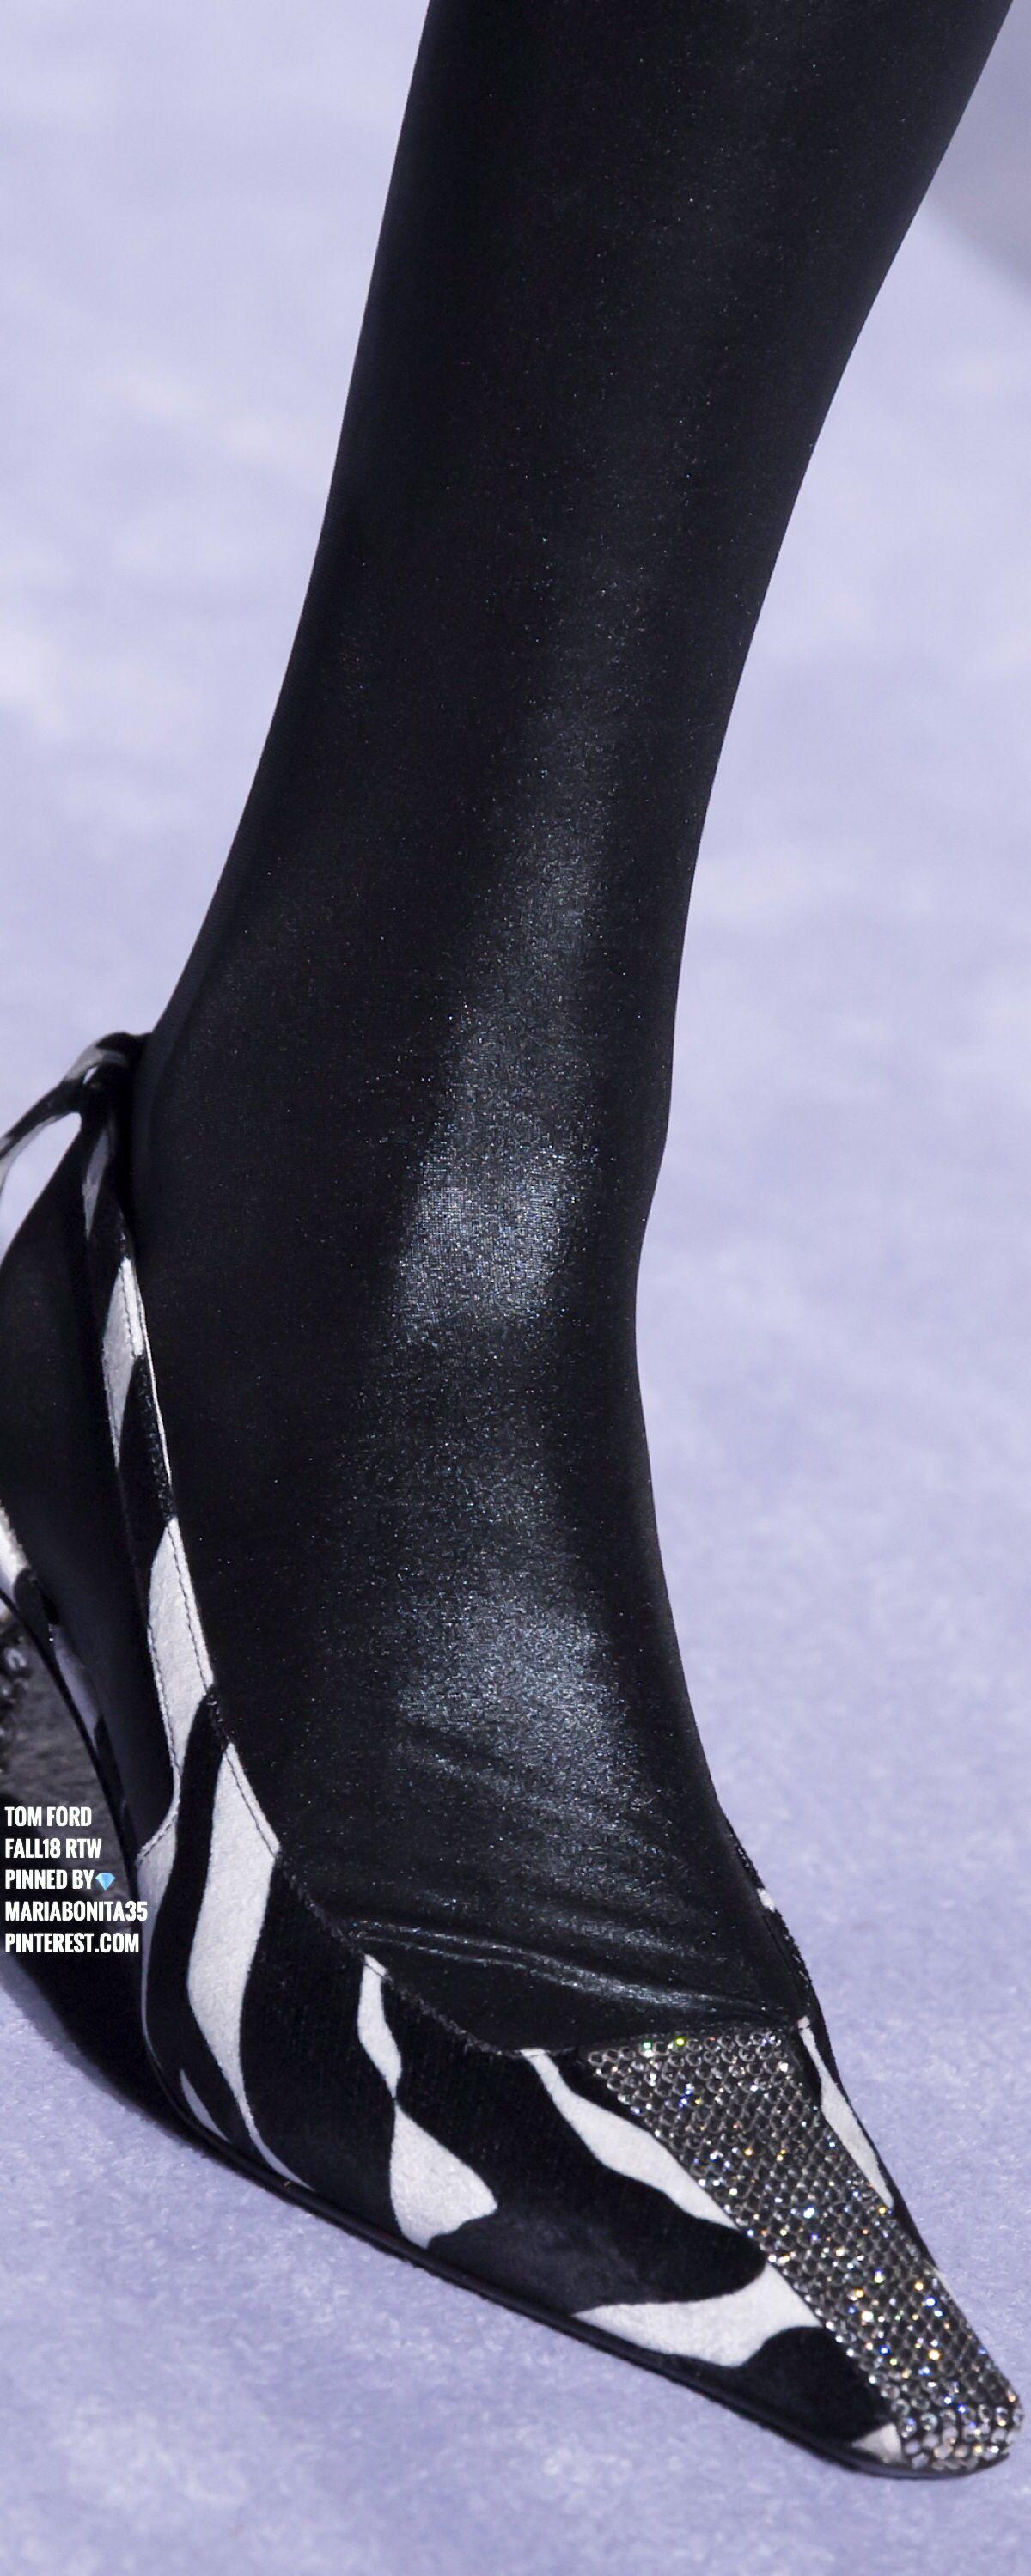 Tom Ford Fall18 Details Tom Ford American Fashion Designers Shoe Boots